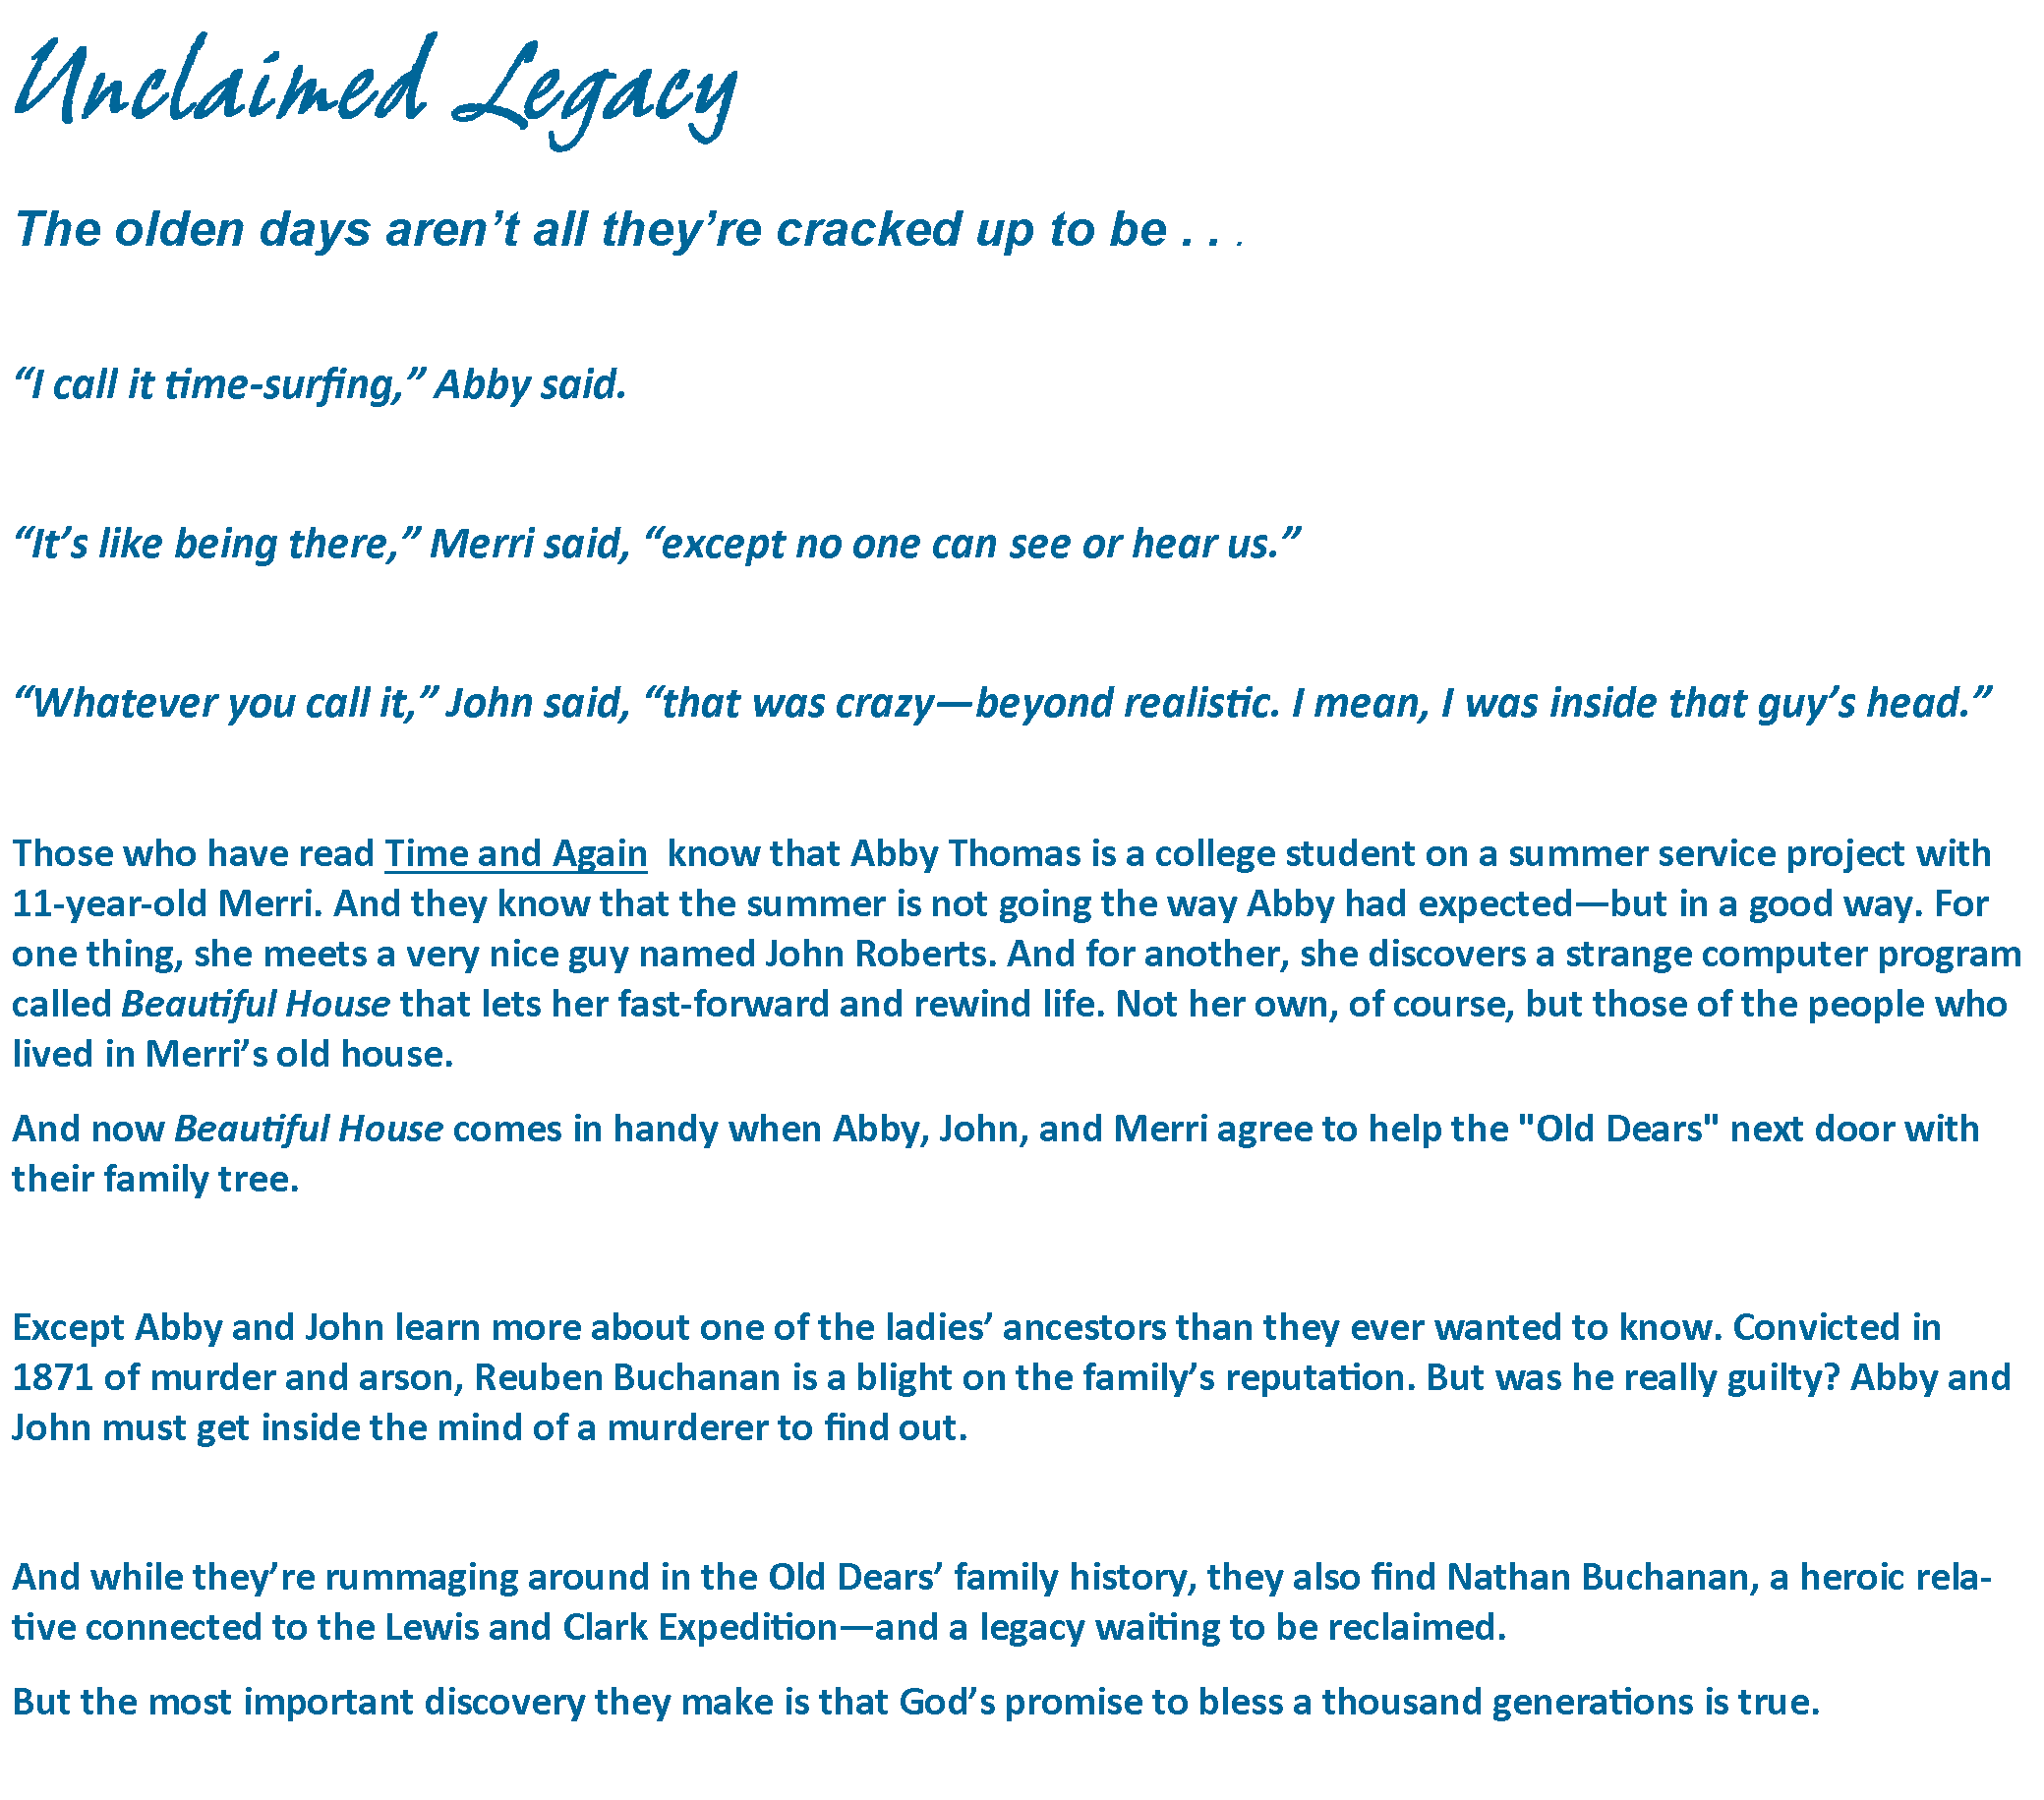 Unclaimed Legacy Blurb